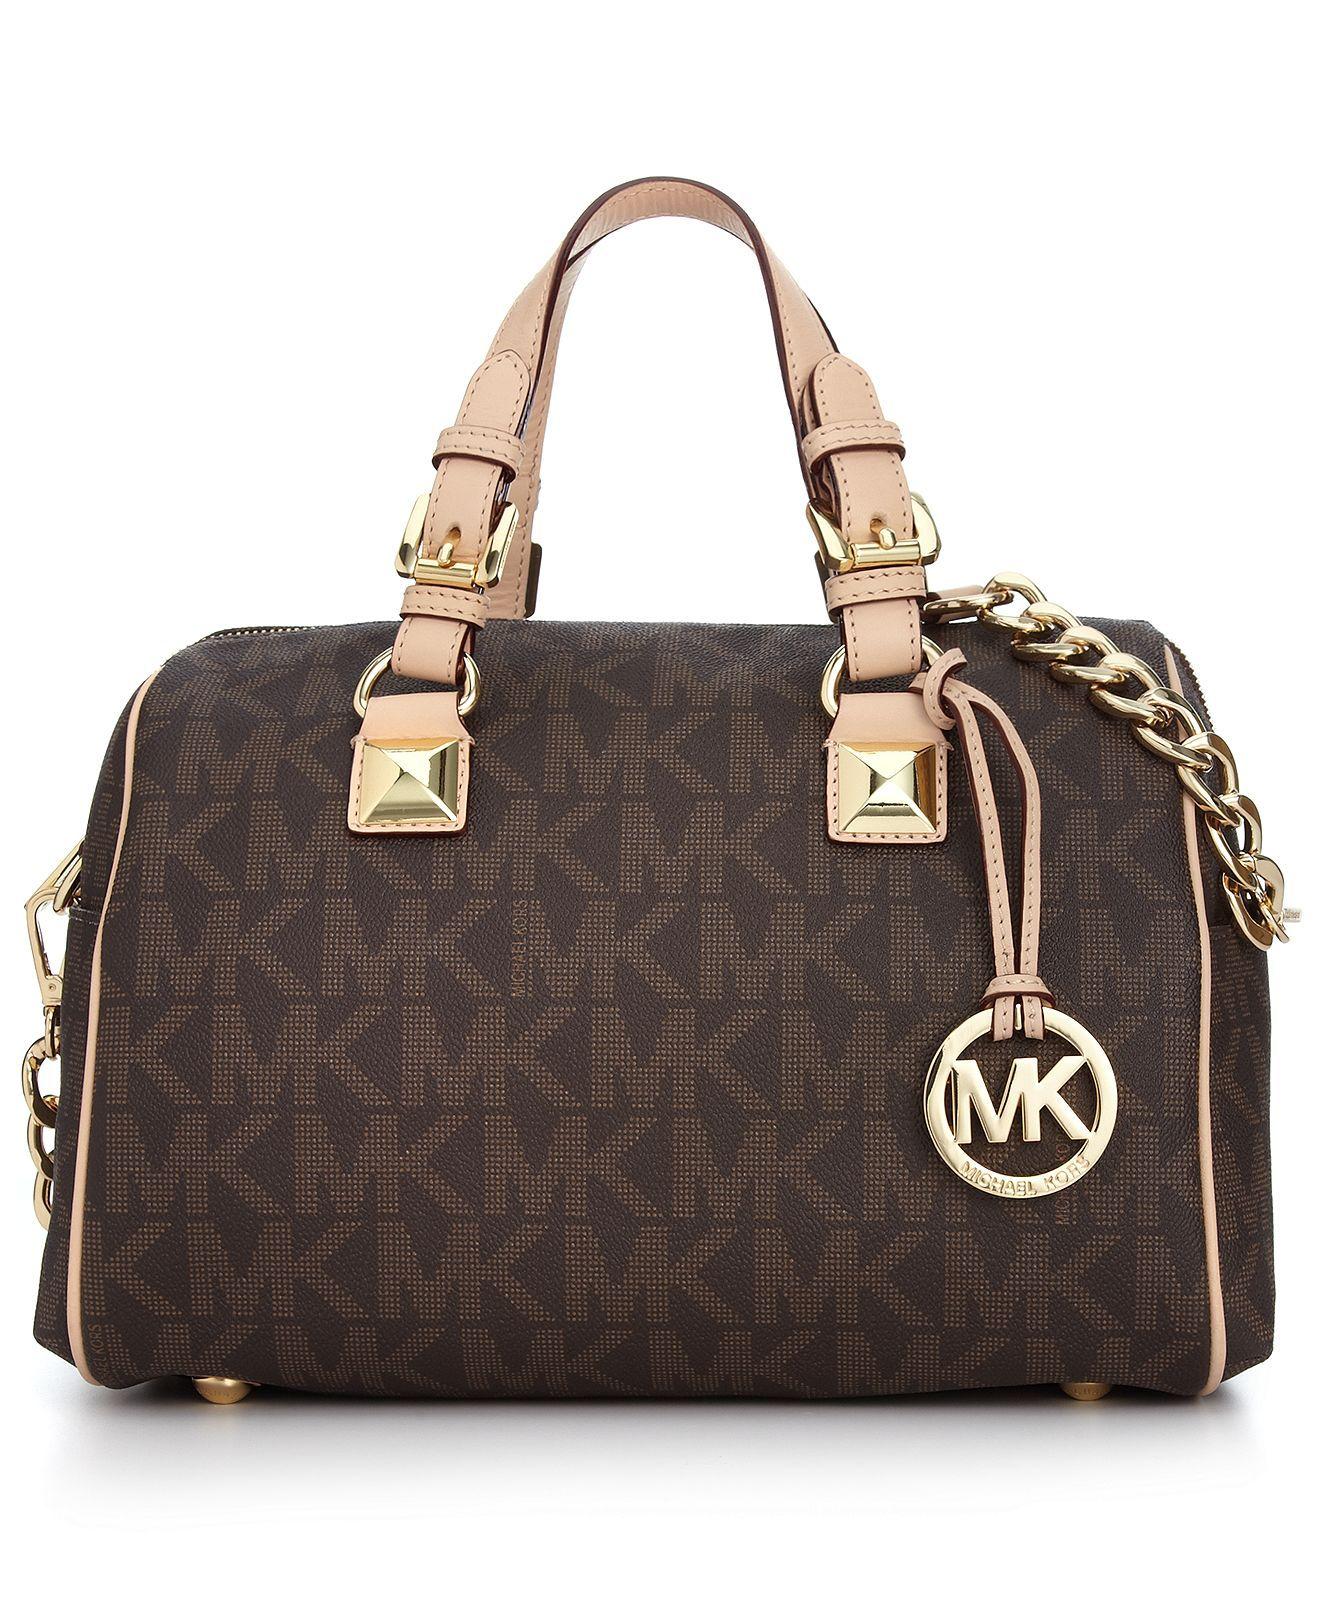 209554147283 ... cheapest michael micheal kors handbag grayson monogram medium satchel  handbags handbags accessories macys 1b031 98e76